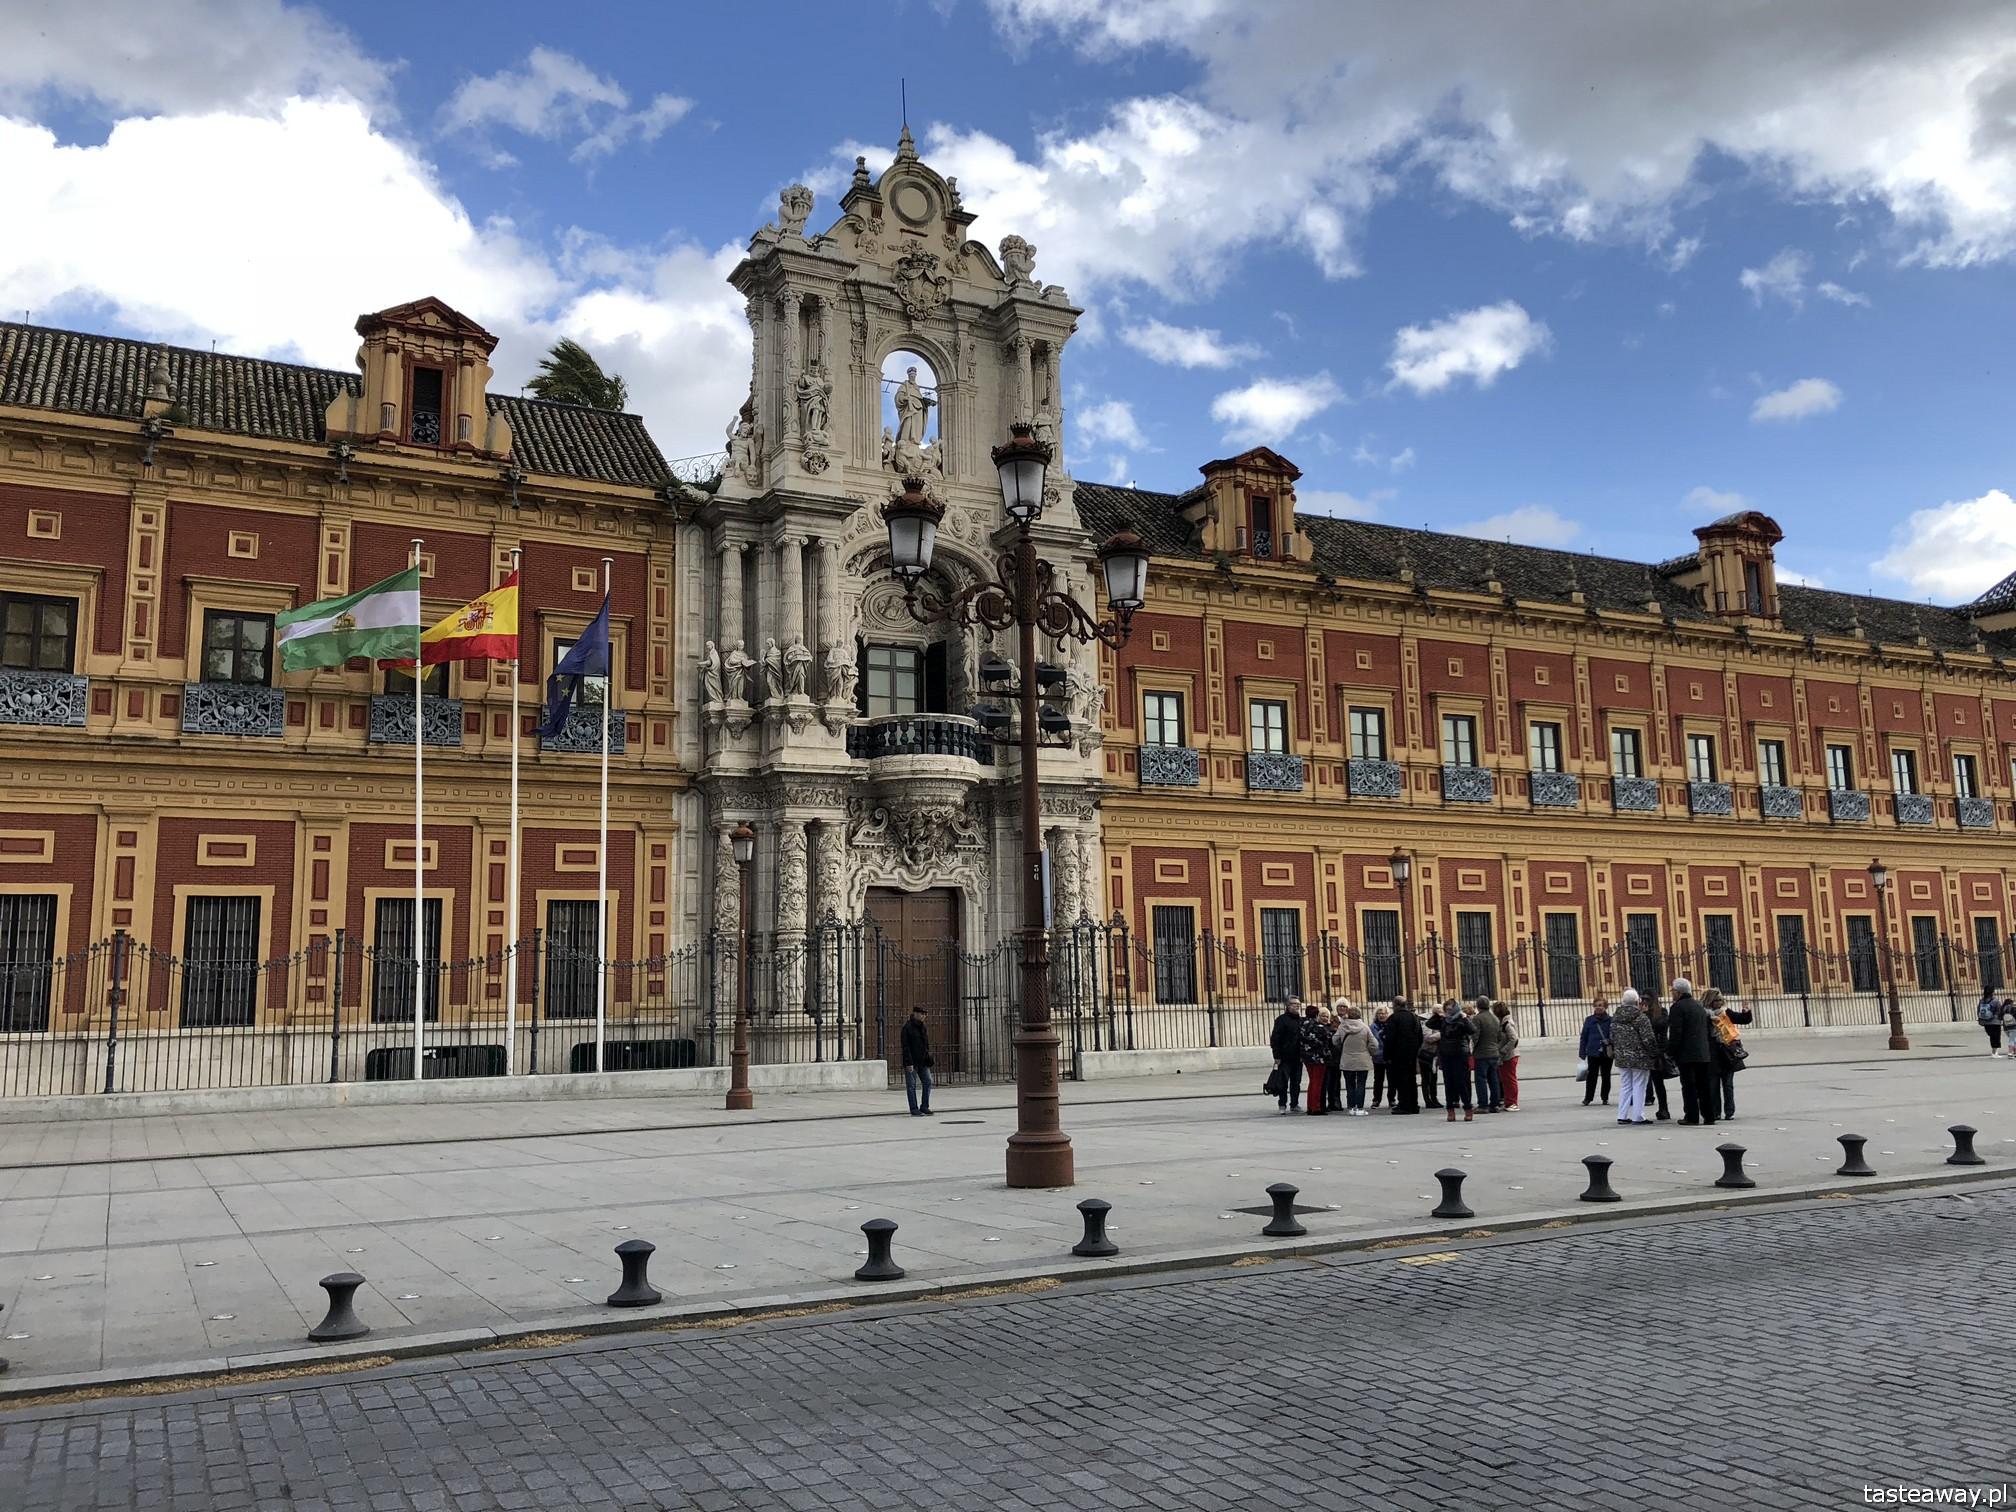 Sewilla, Sevilla, co zobaczyć w Sewilli, Sevilla w jeden dzień, Andaluzja, miasta Hiszpanii, spacer po Sevilli